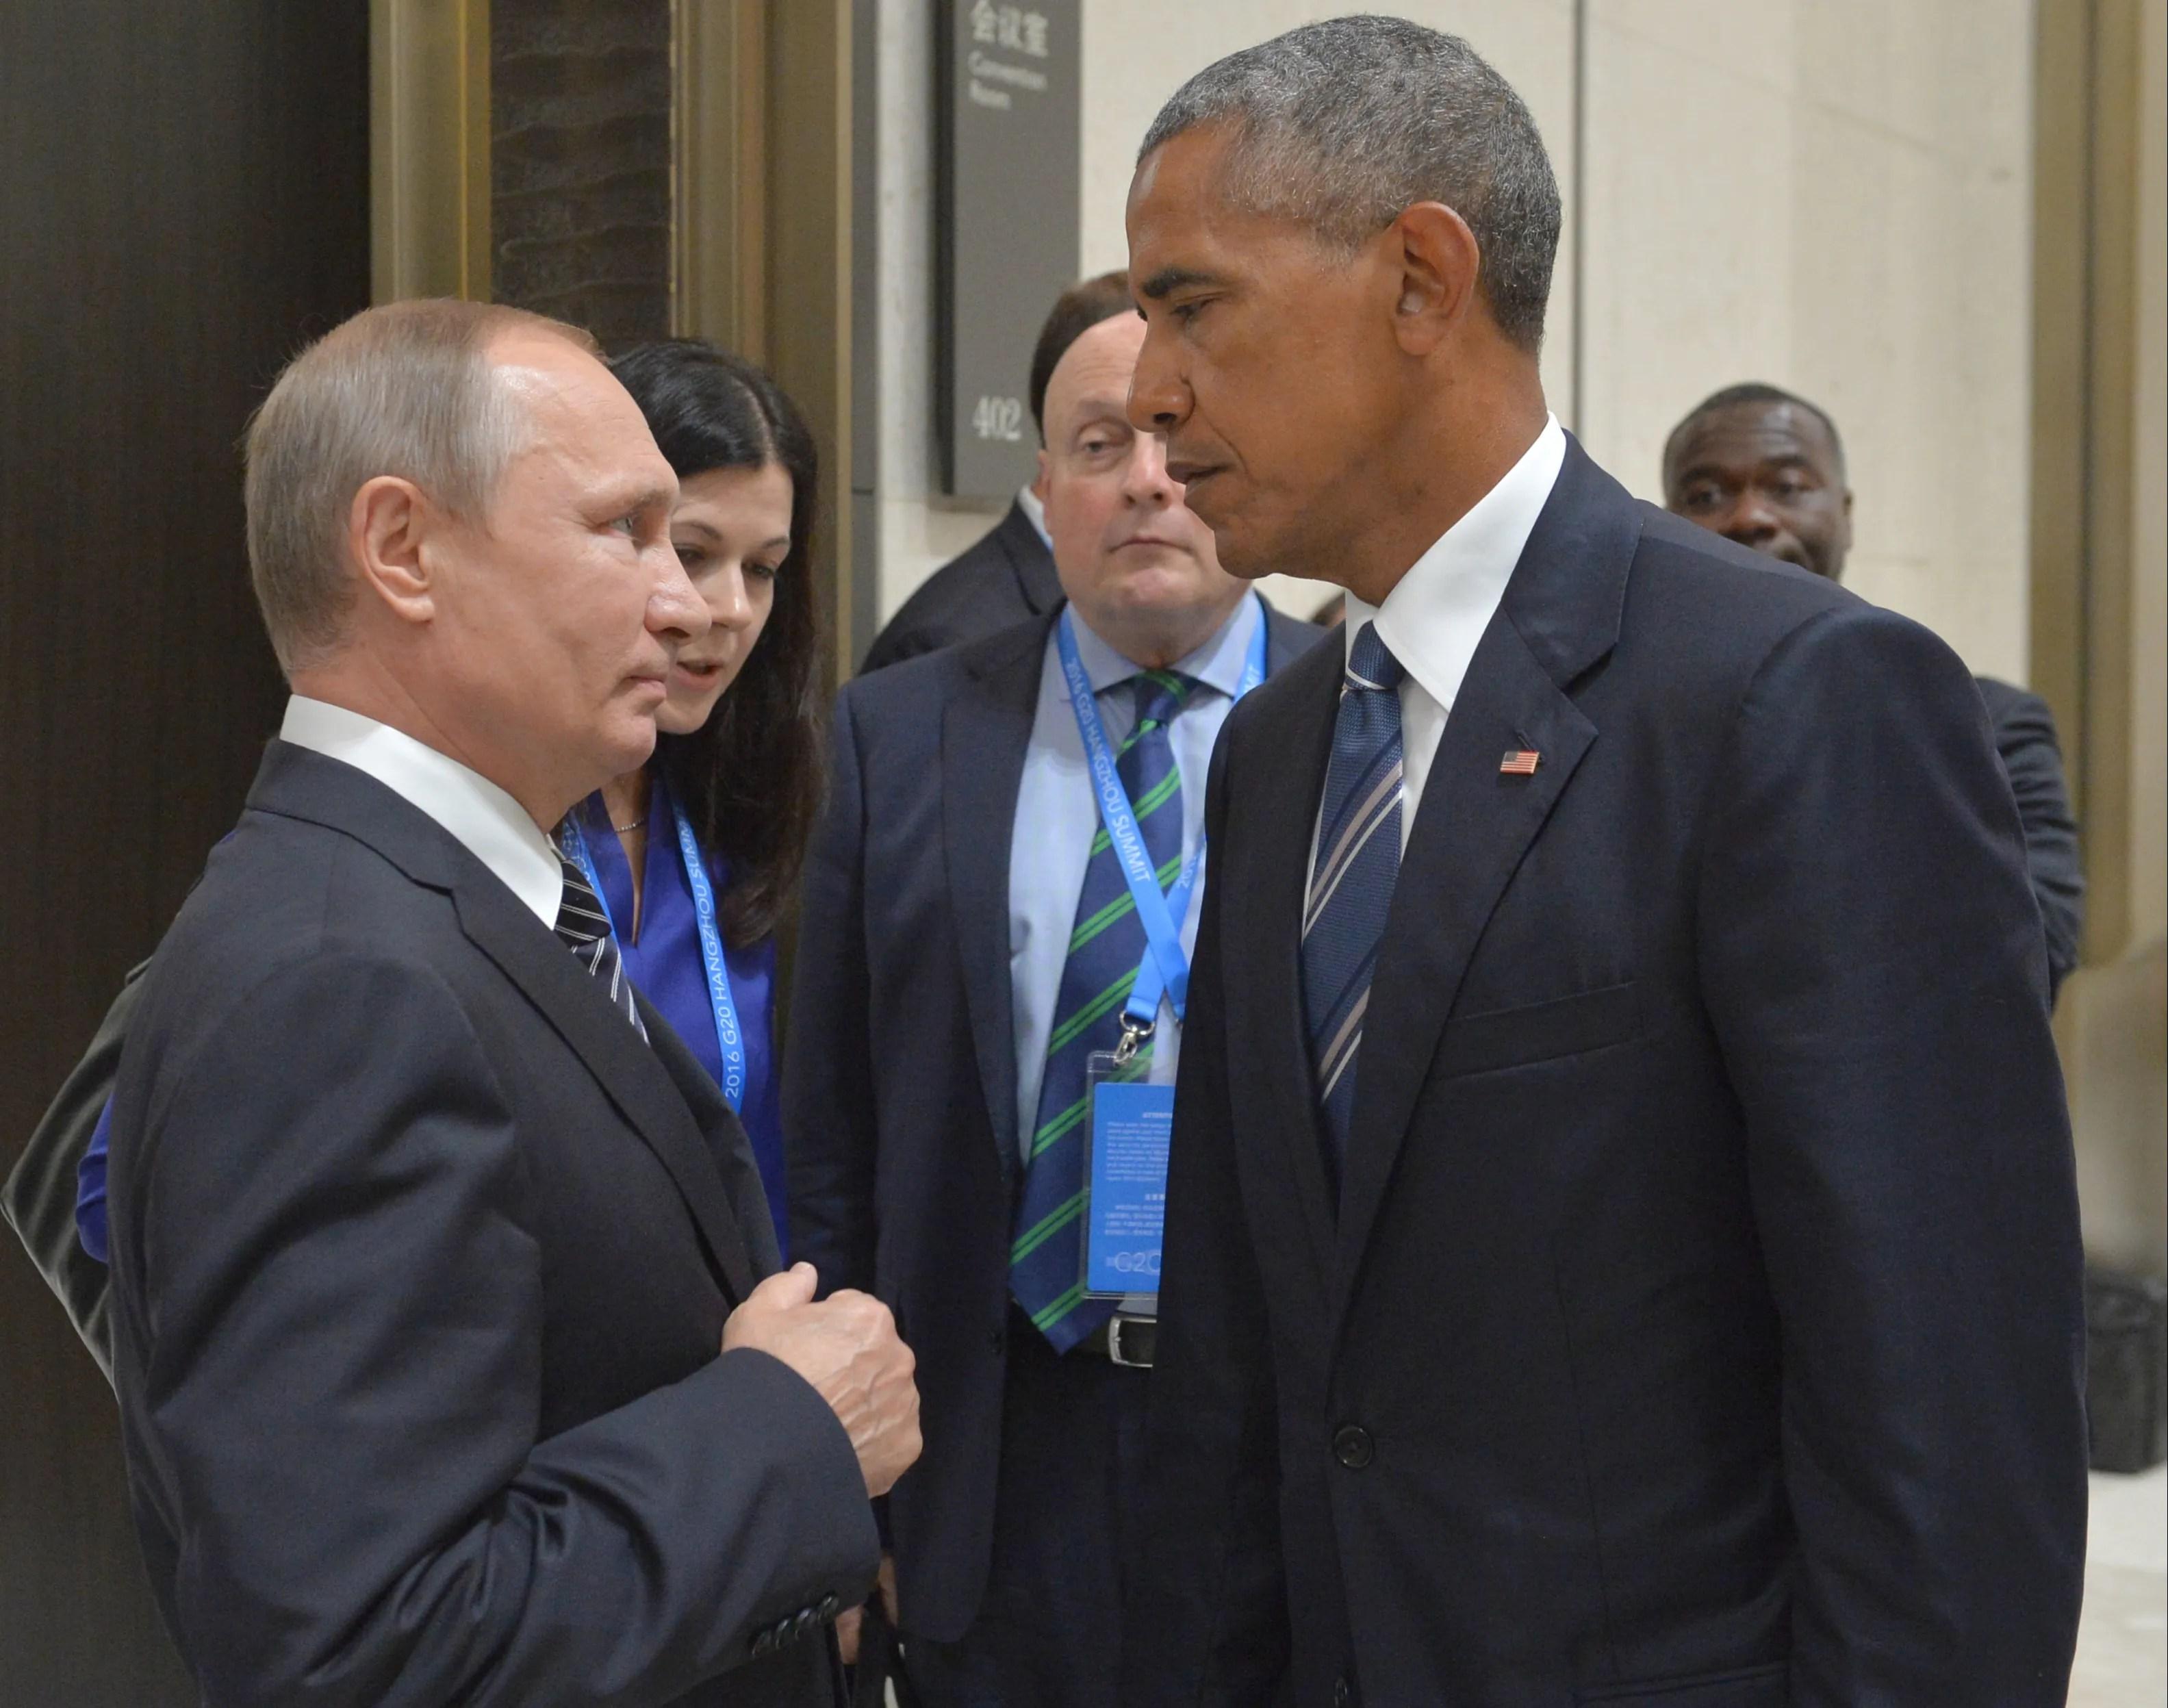 Russian President Vladimir Putin, left, speaks with US President Barack Obama in Hangzhou, east China's Zhejiang Province, September 5, 2016.